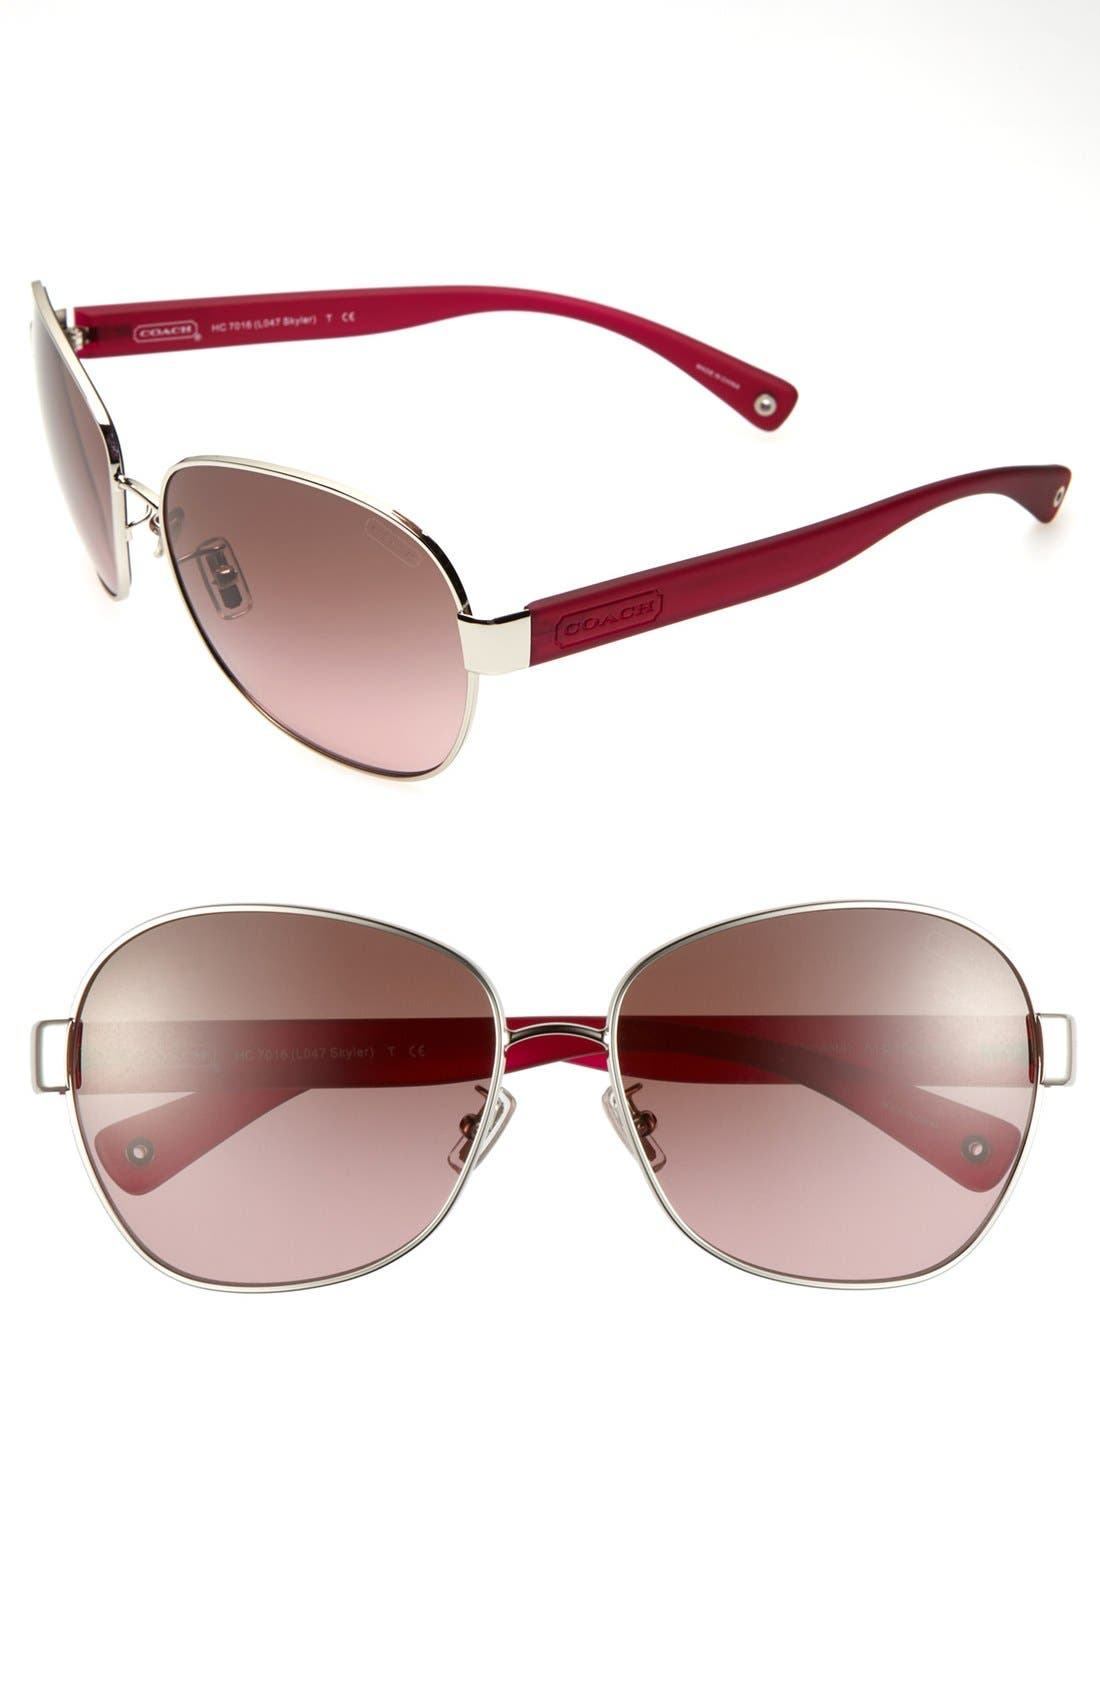 Main Image - COACH 'Skyler' 61mm Sunglasses